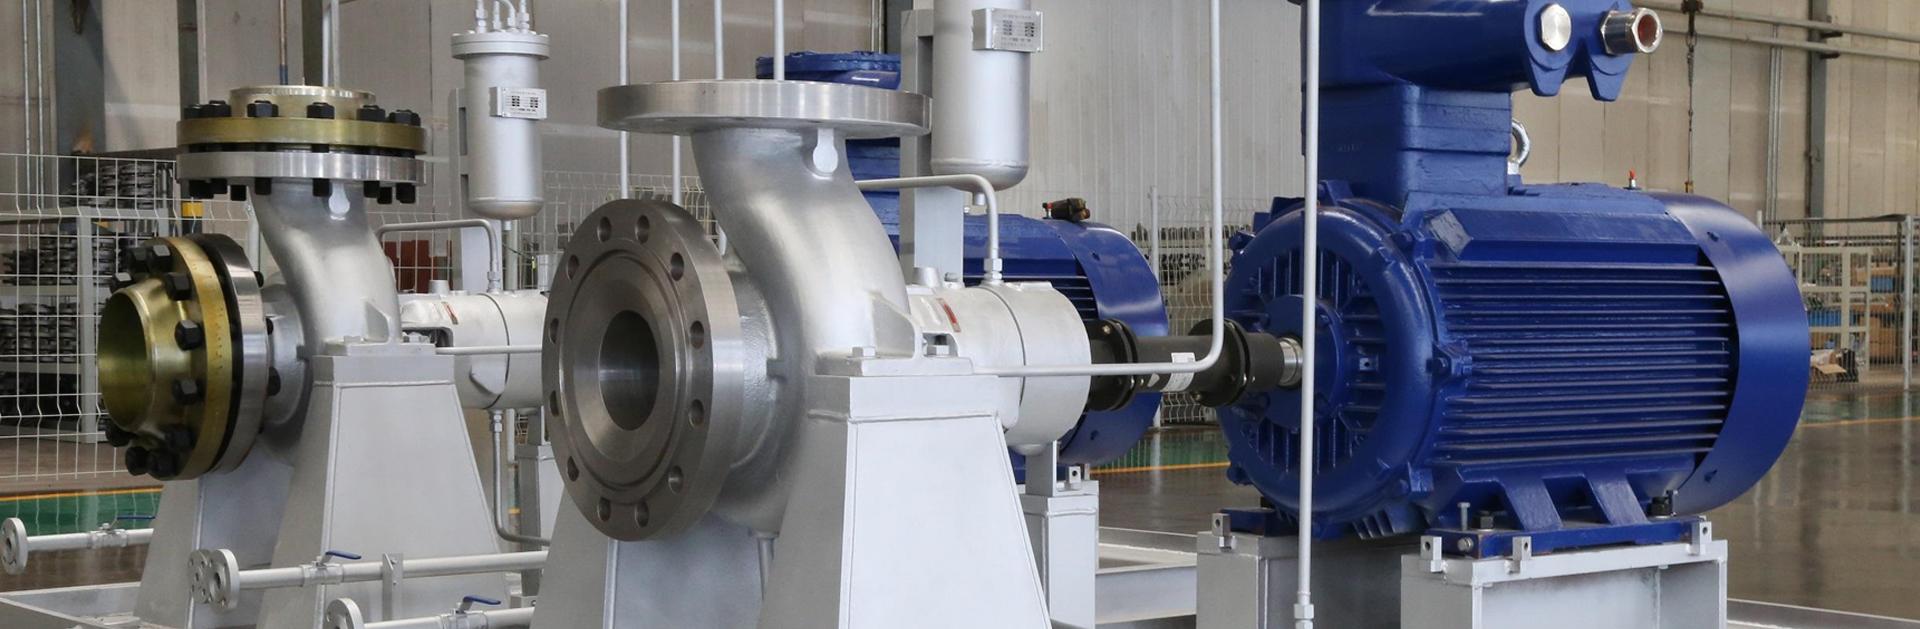 Pump & Valve Parts Die Casting Manufacturer China, Custom Pump ary Valve Parts